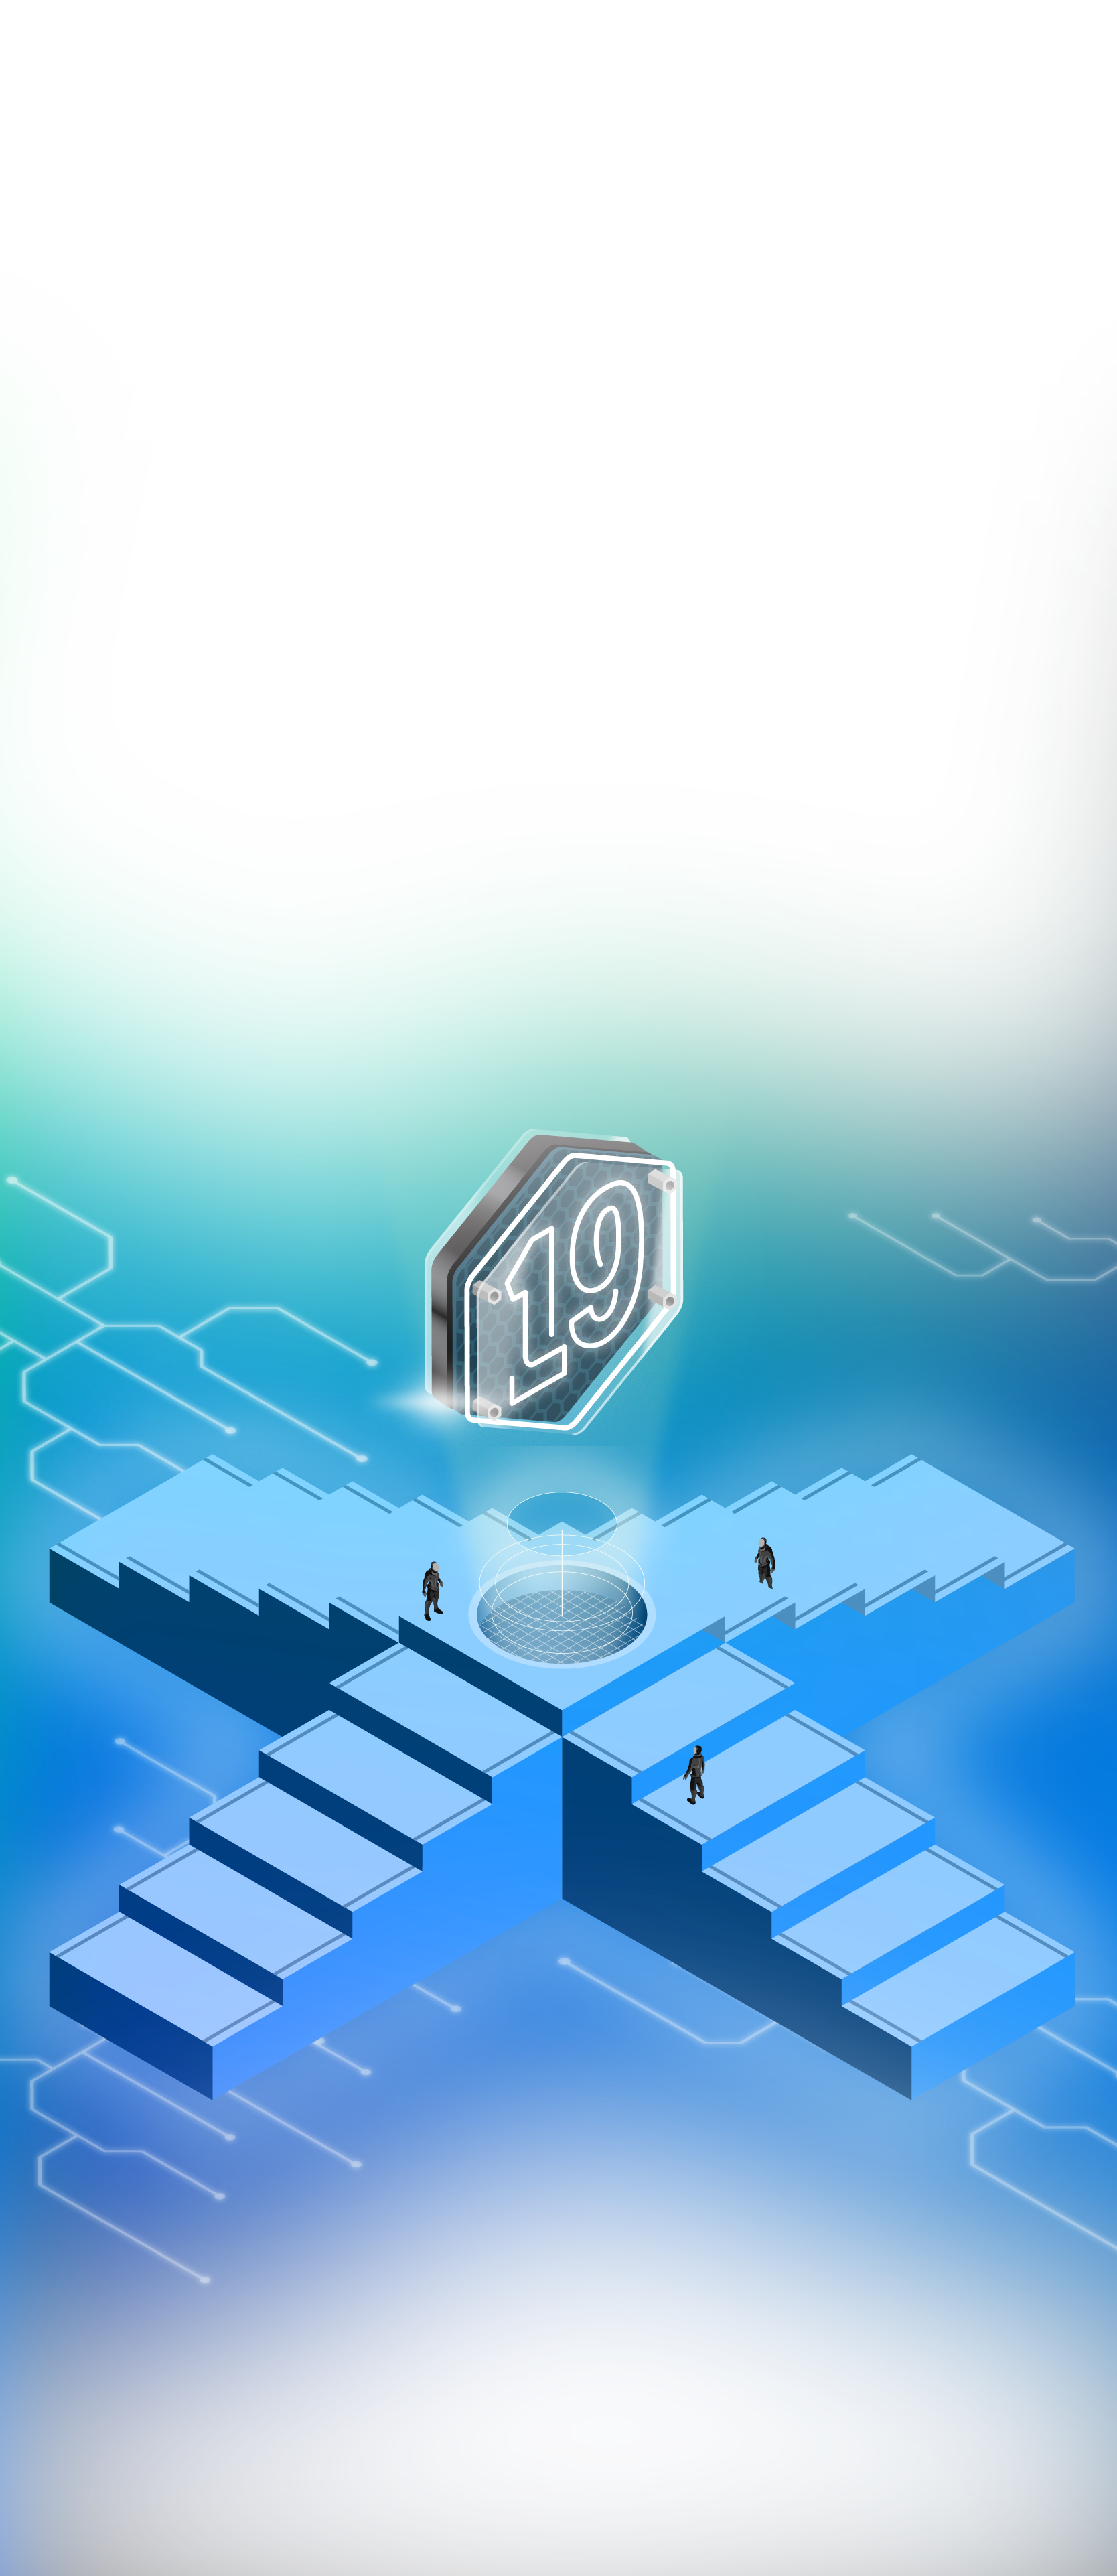 NGINX Conference 2019 logo